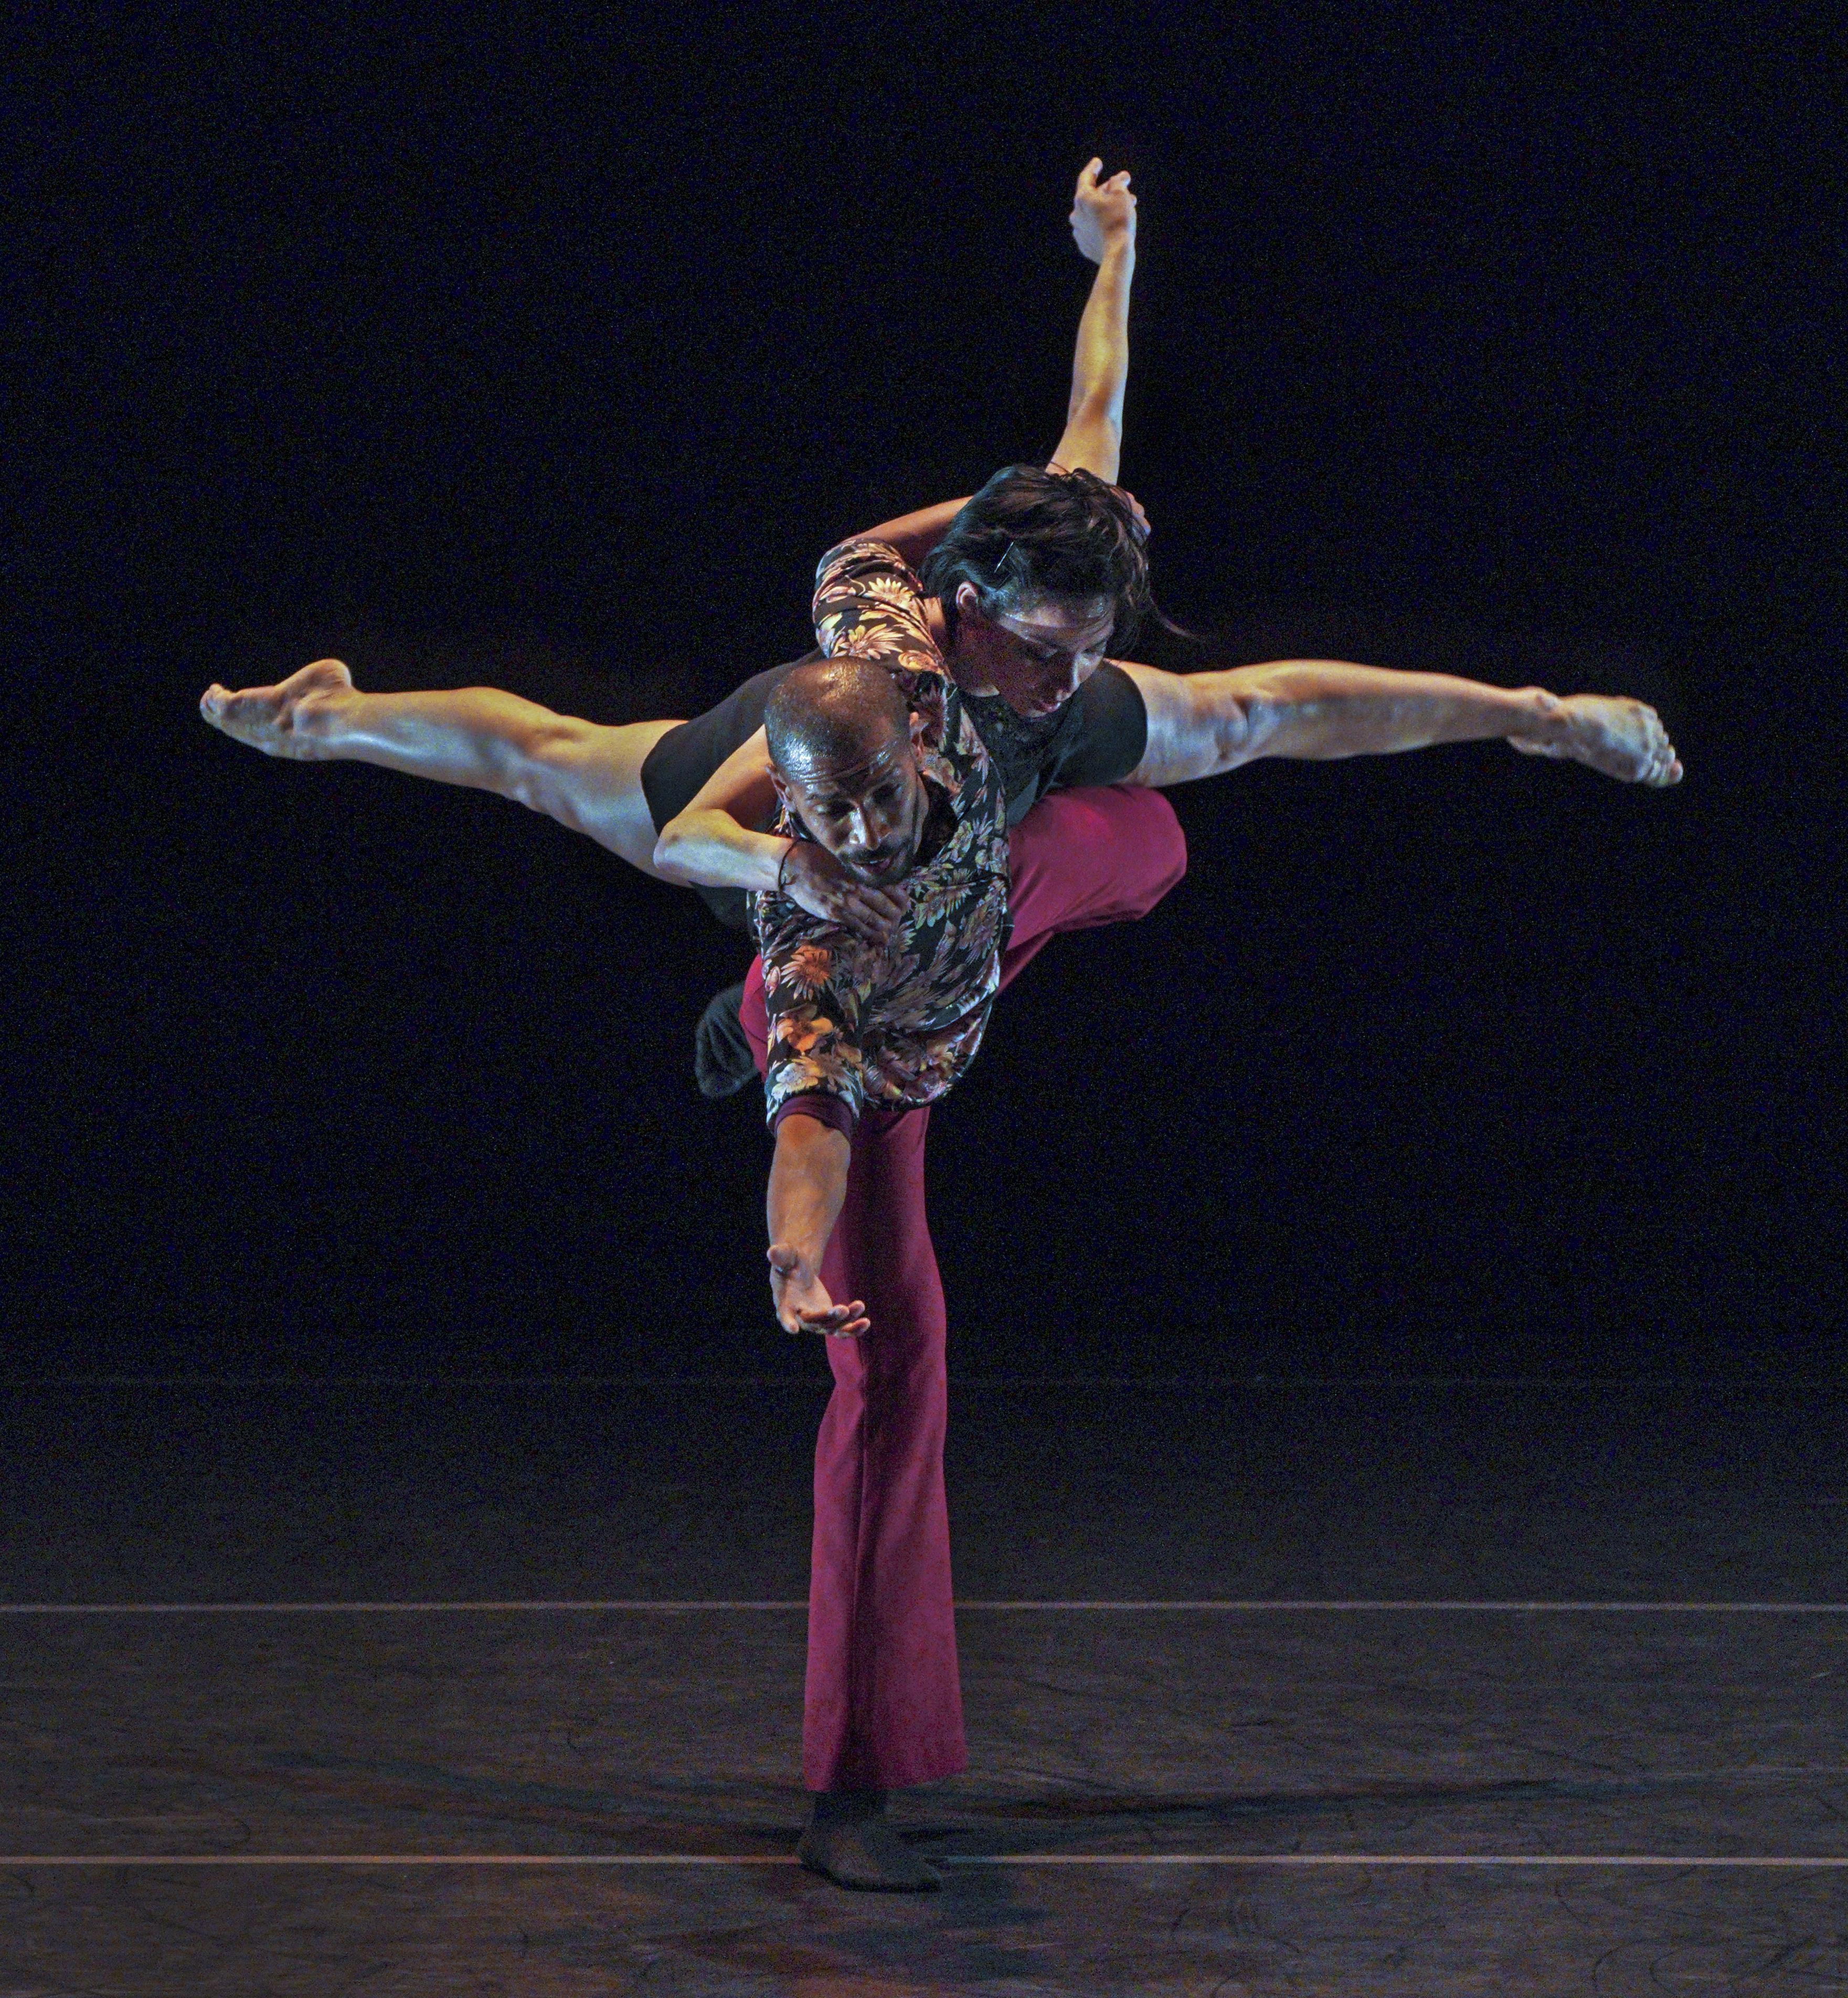 Ocaso dancers, Daile Carrazana and Osnel Delgado. Photo by  Lawrence K. Ho.